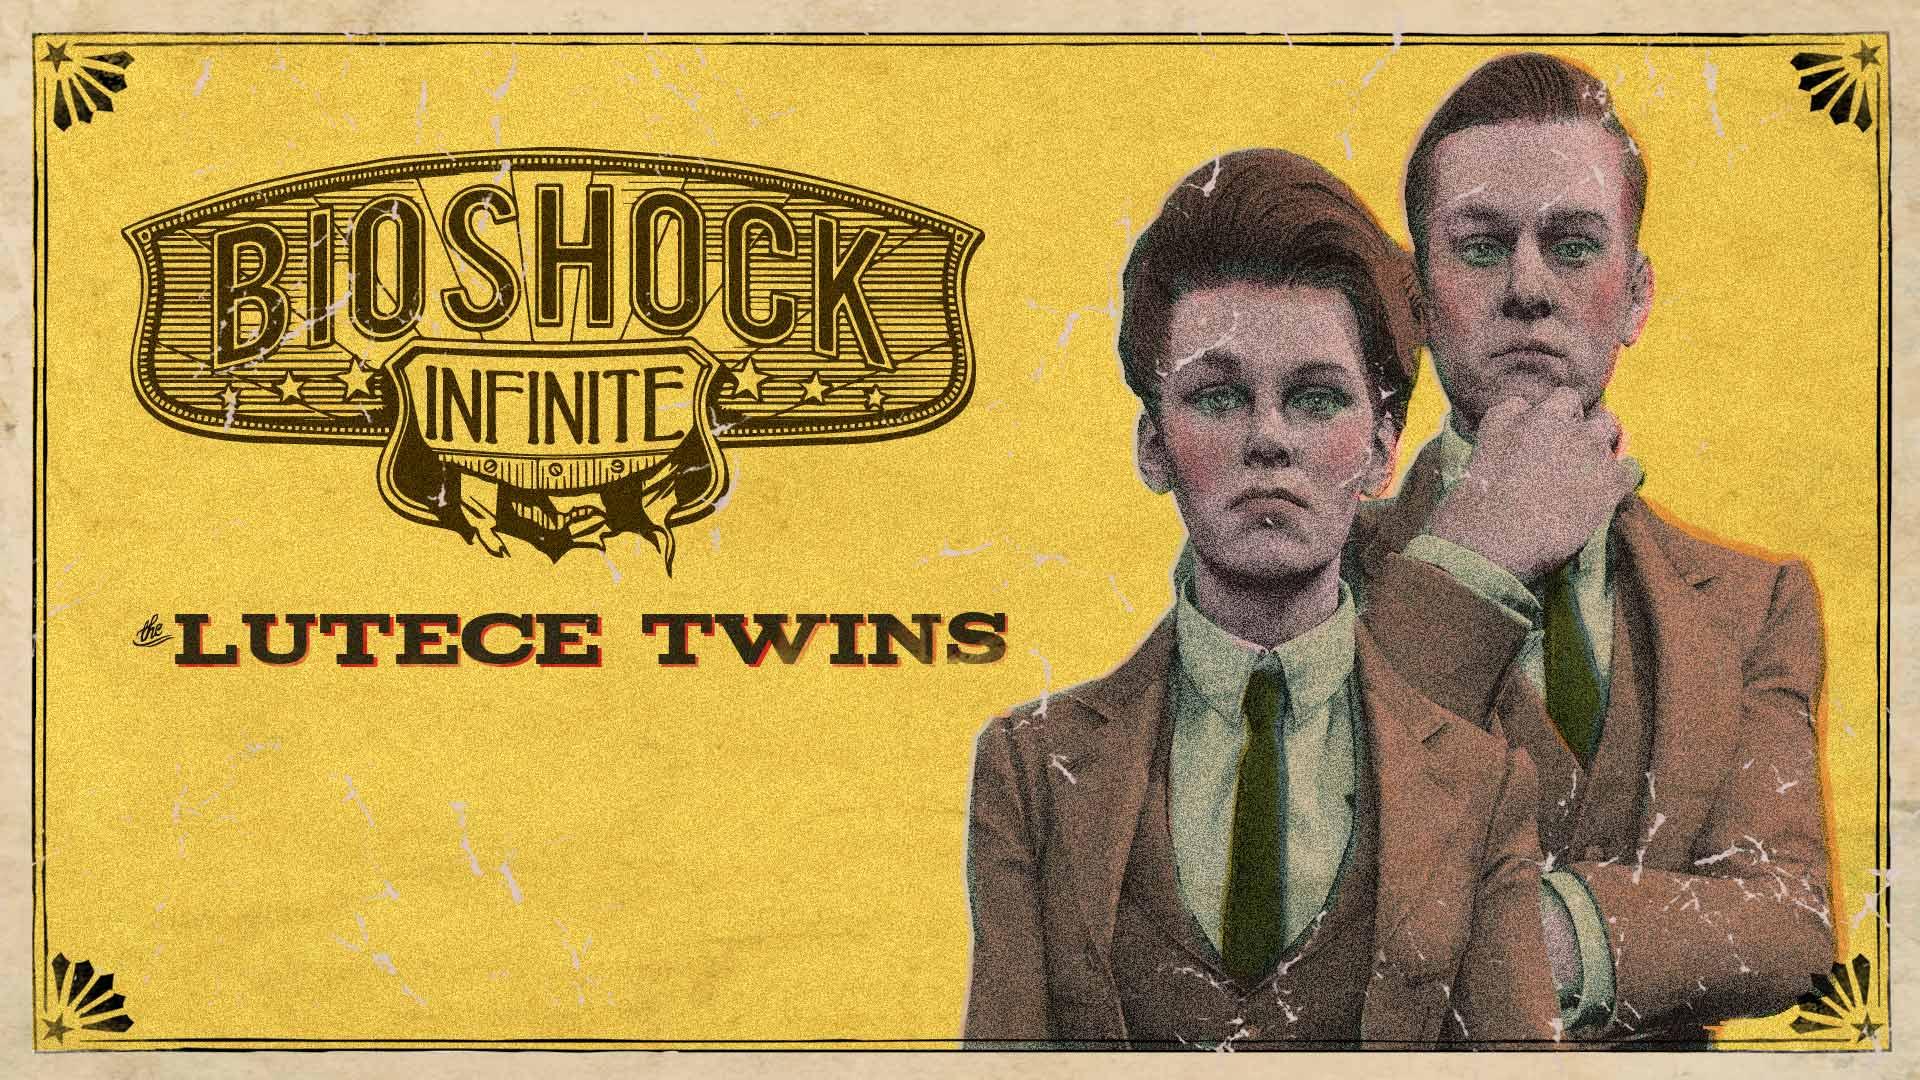 Bioshock infinite lutece twins steam trading cards - Bioshock wikia ...